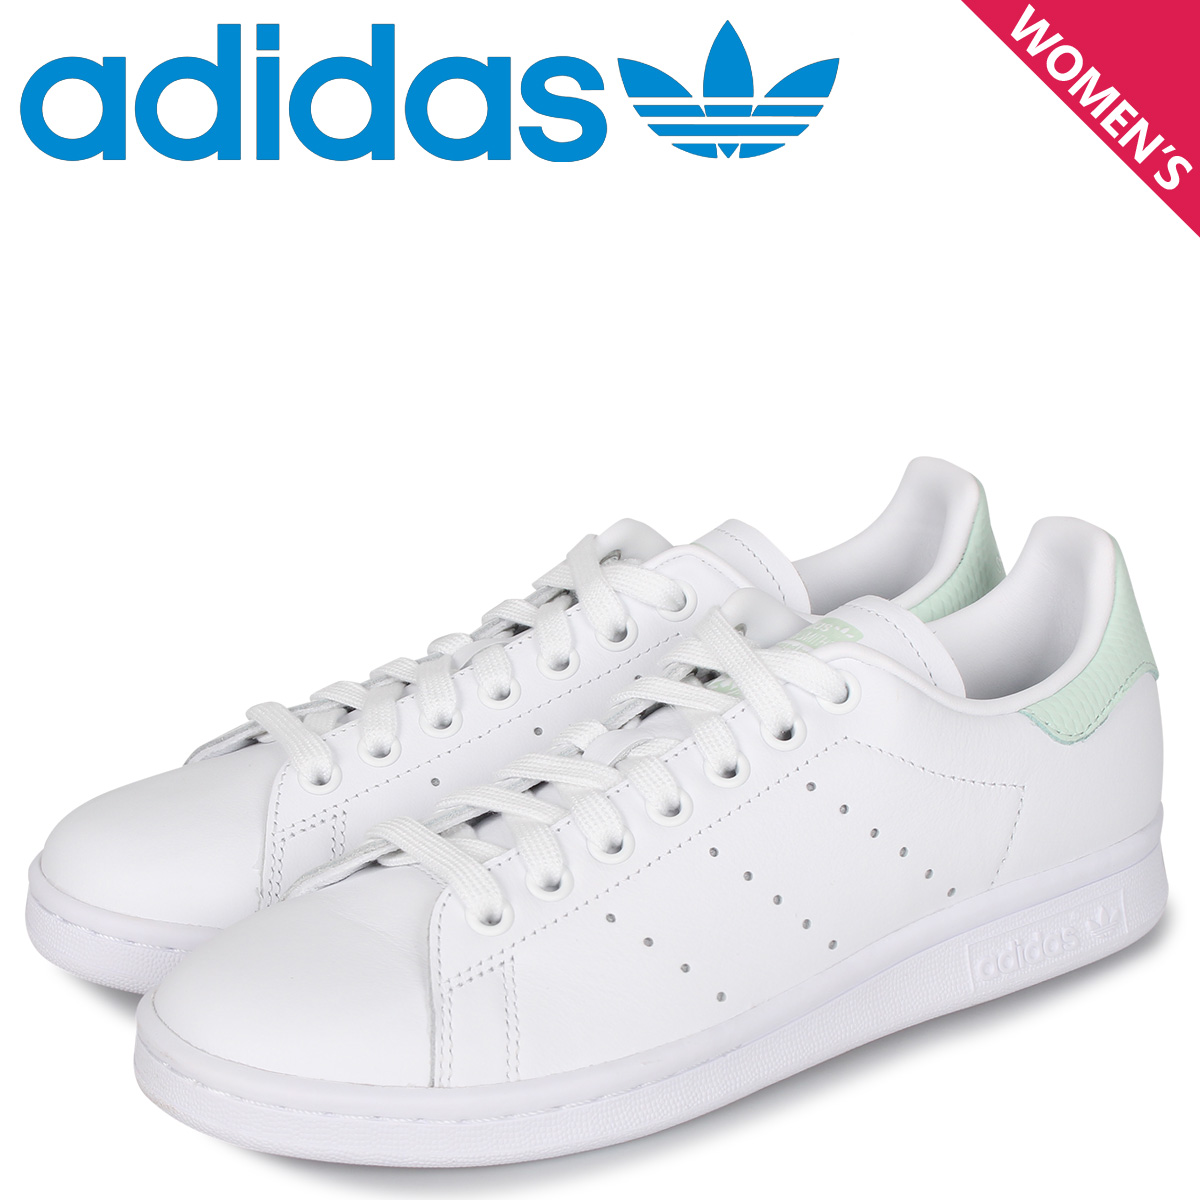 adidas Originals アディダス オリジナルス スタンスミス スニーカー レディース STANSMITH W ホワイト 白 EF6876